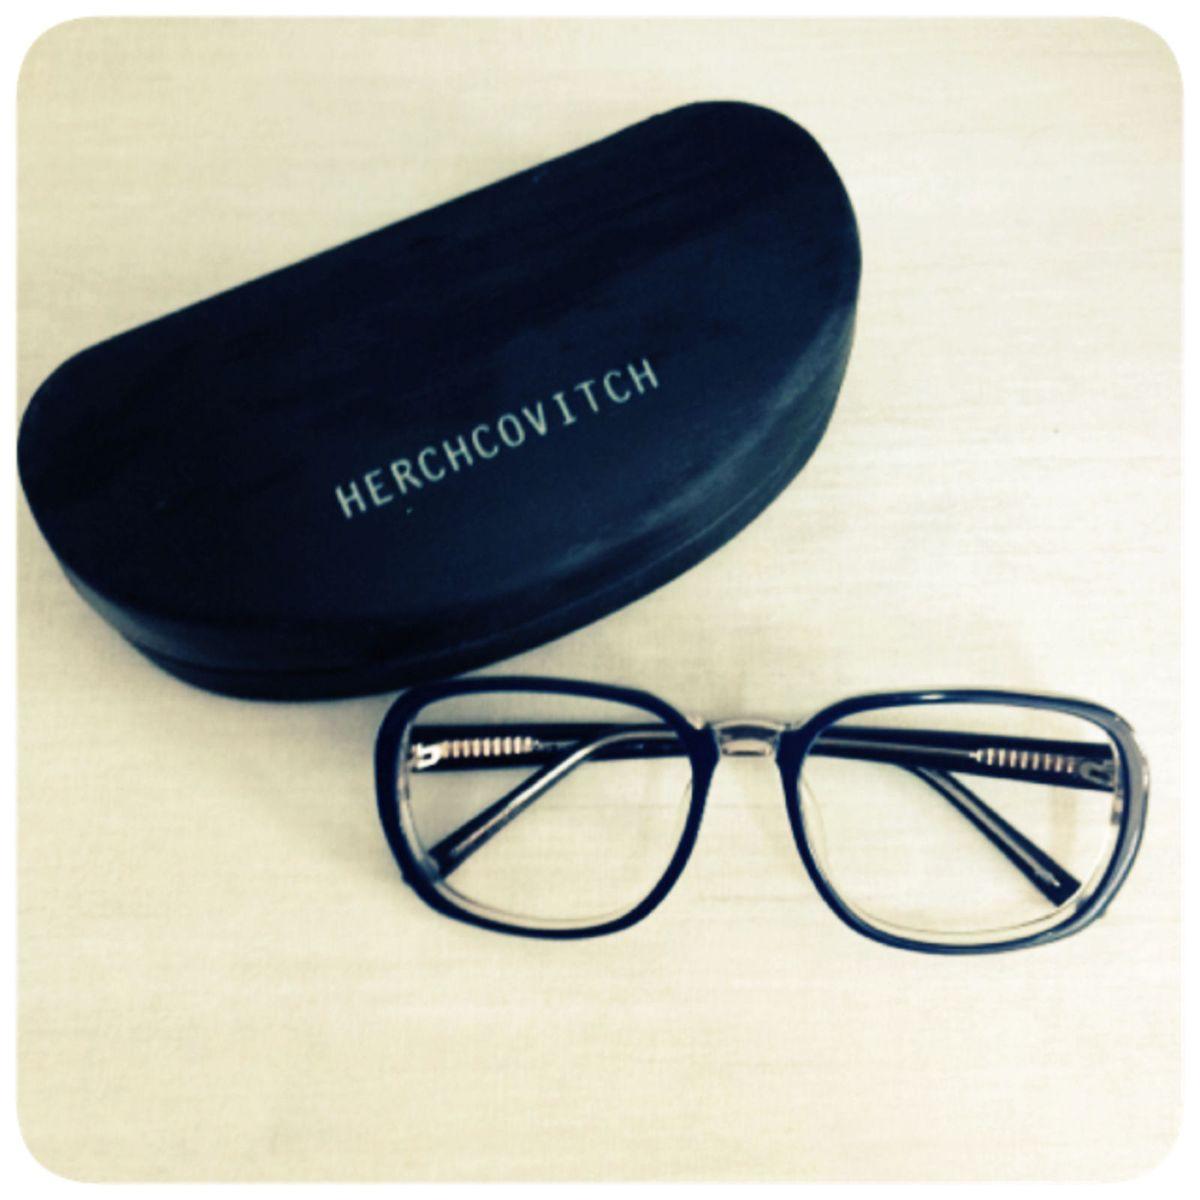 2779d7d5687ca Óculos de Grau Herchcovitch Chilli Beans   Óculos Feminino Nunca ...